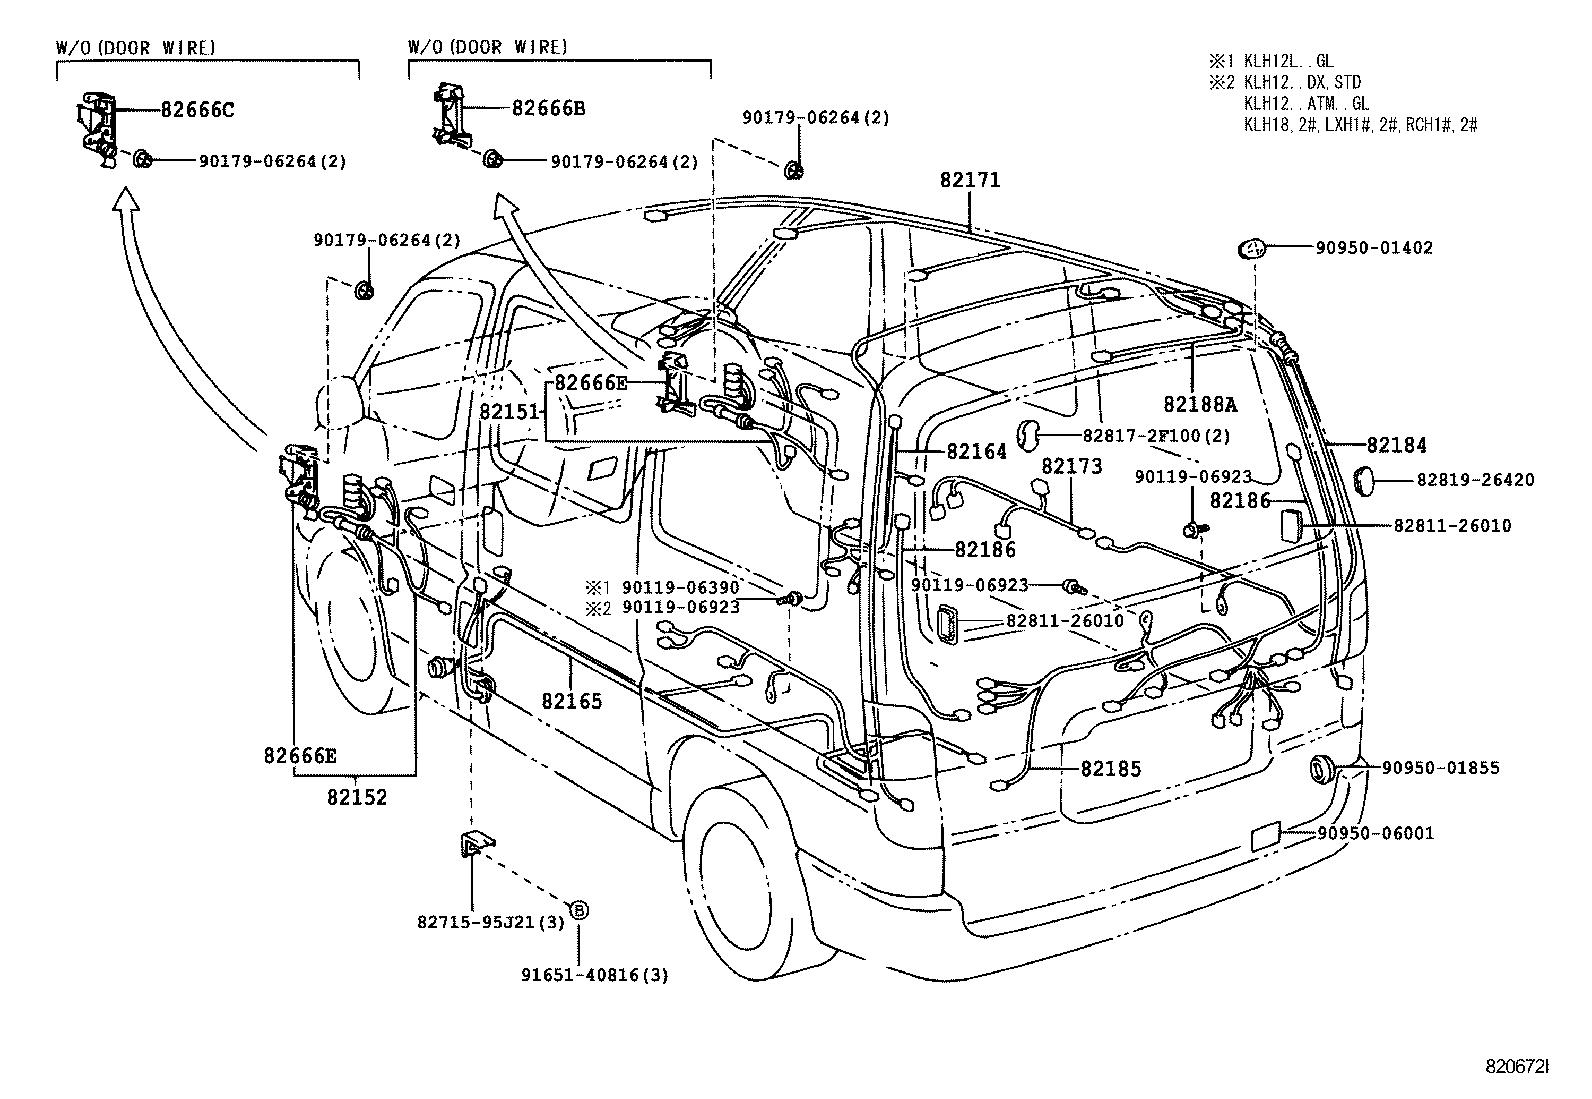 1991 cadillac tail light wiring diagram